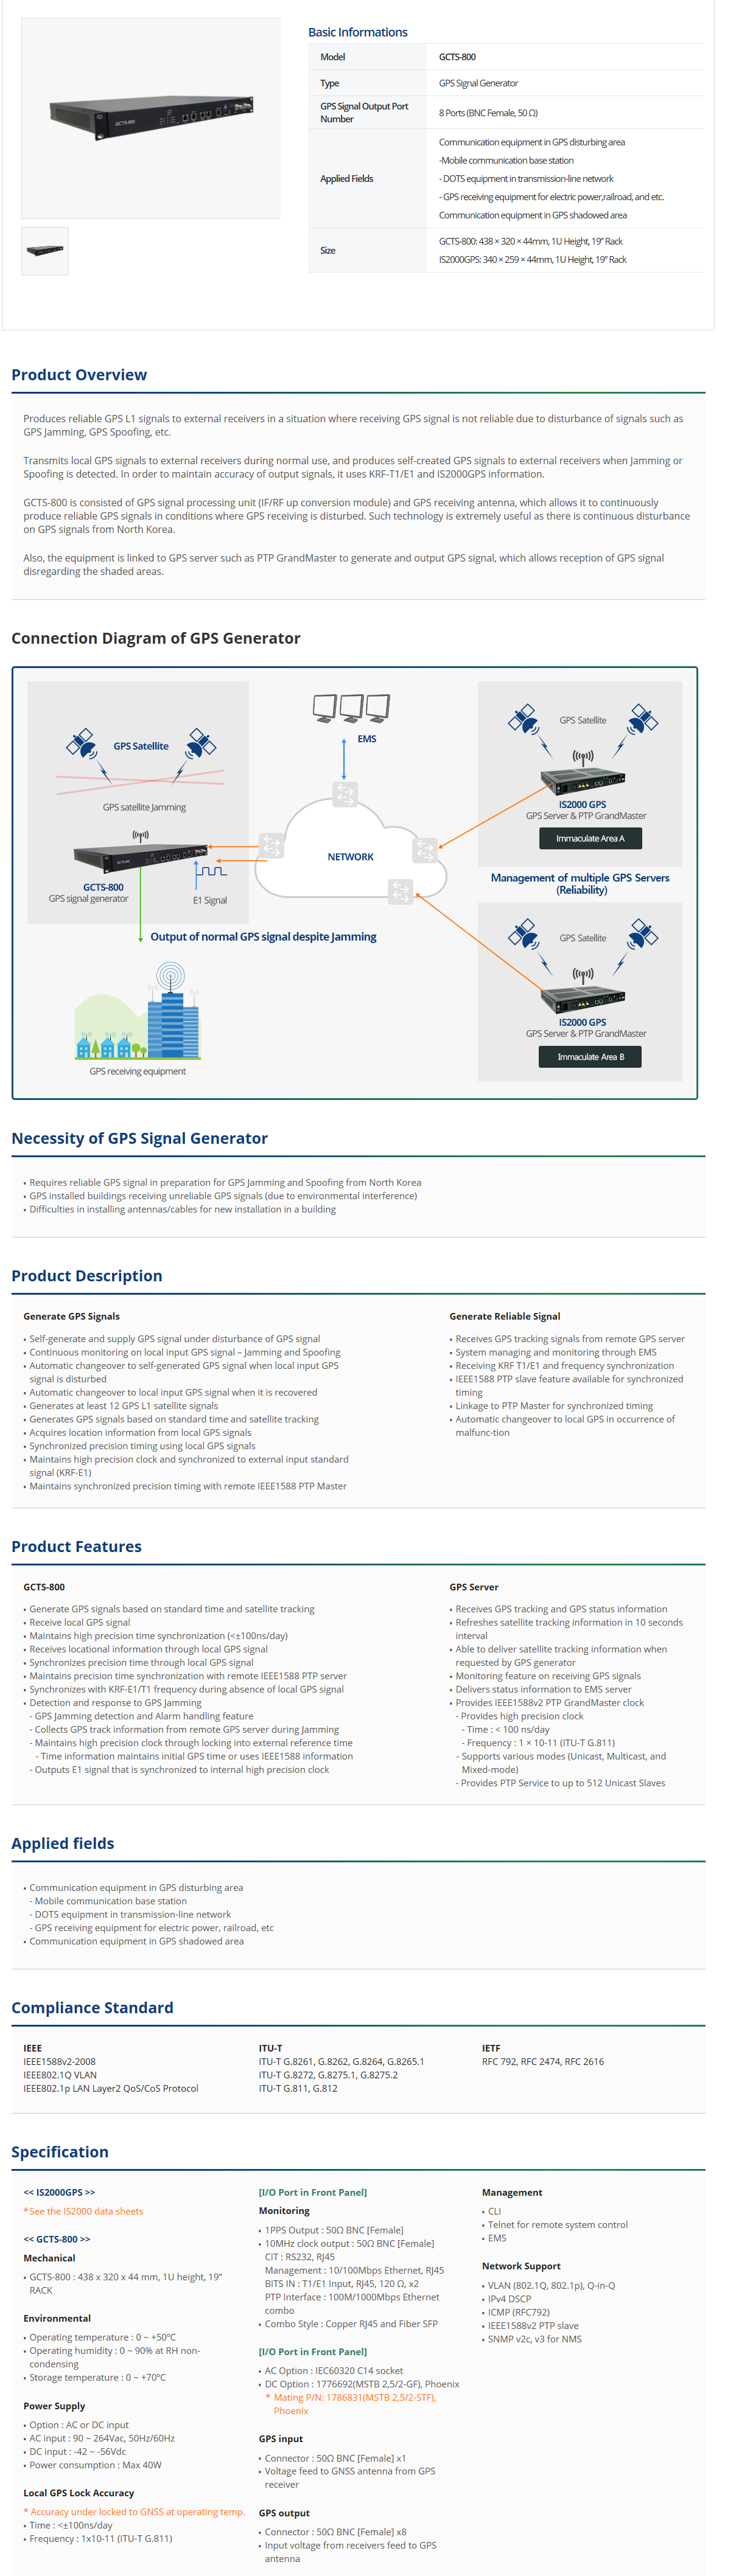 Spring Wave Information & Telecom GPS Signal Generator GCTS-800